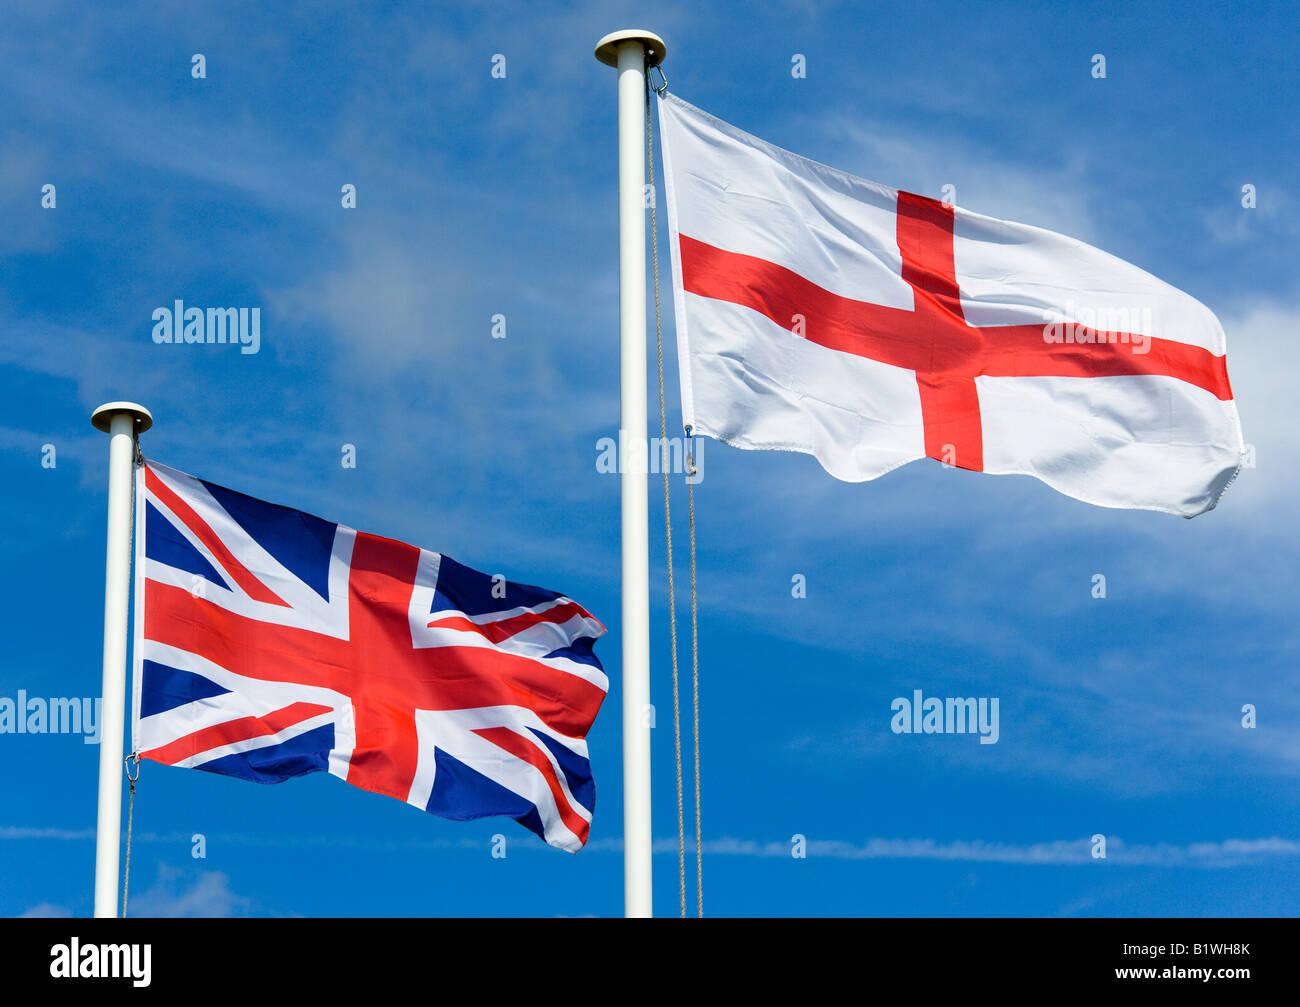 england west sussex littlehampton union jack or union flag and